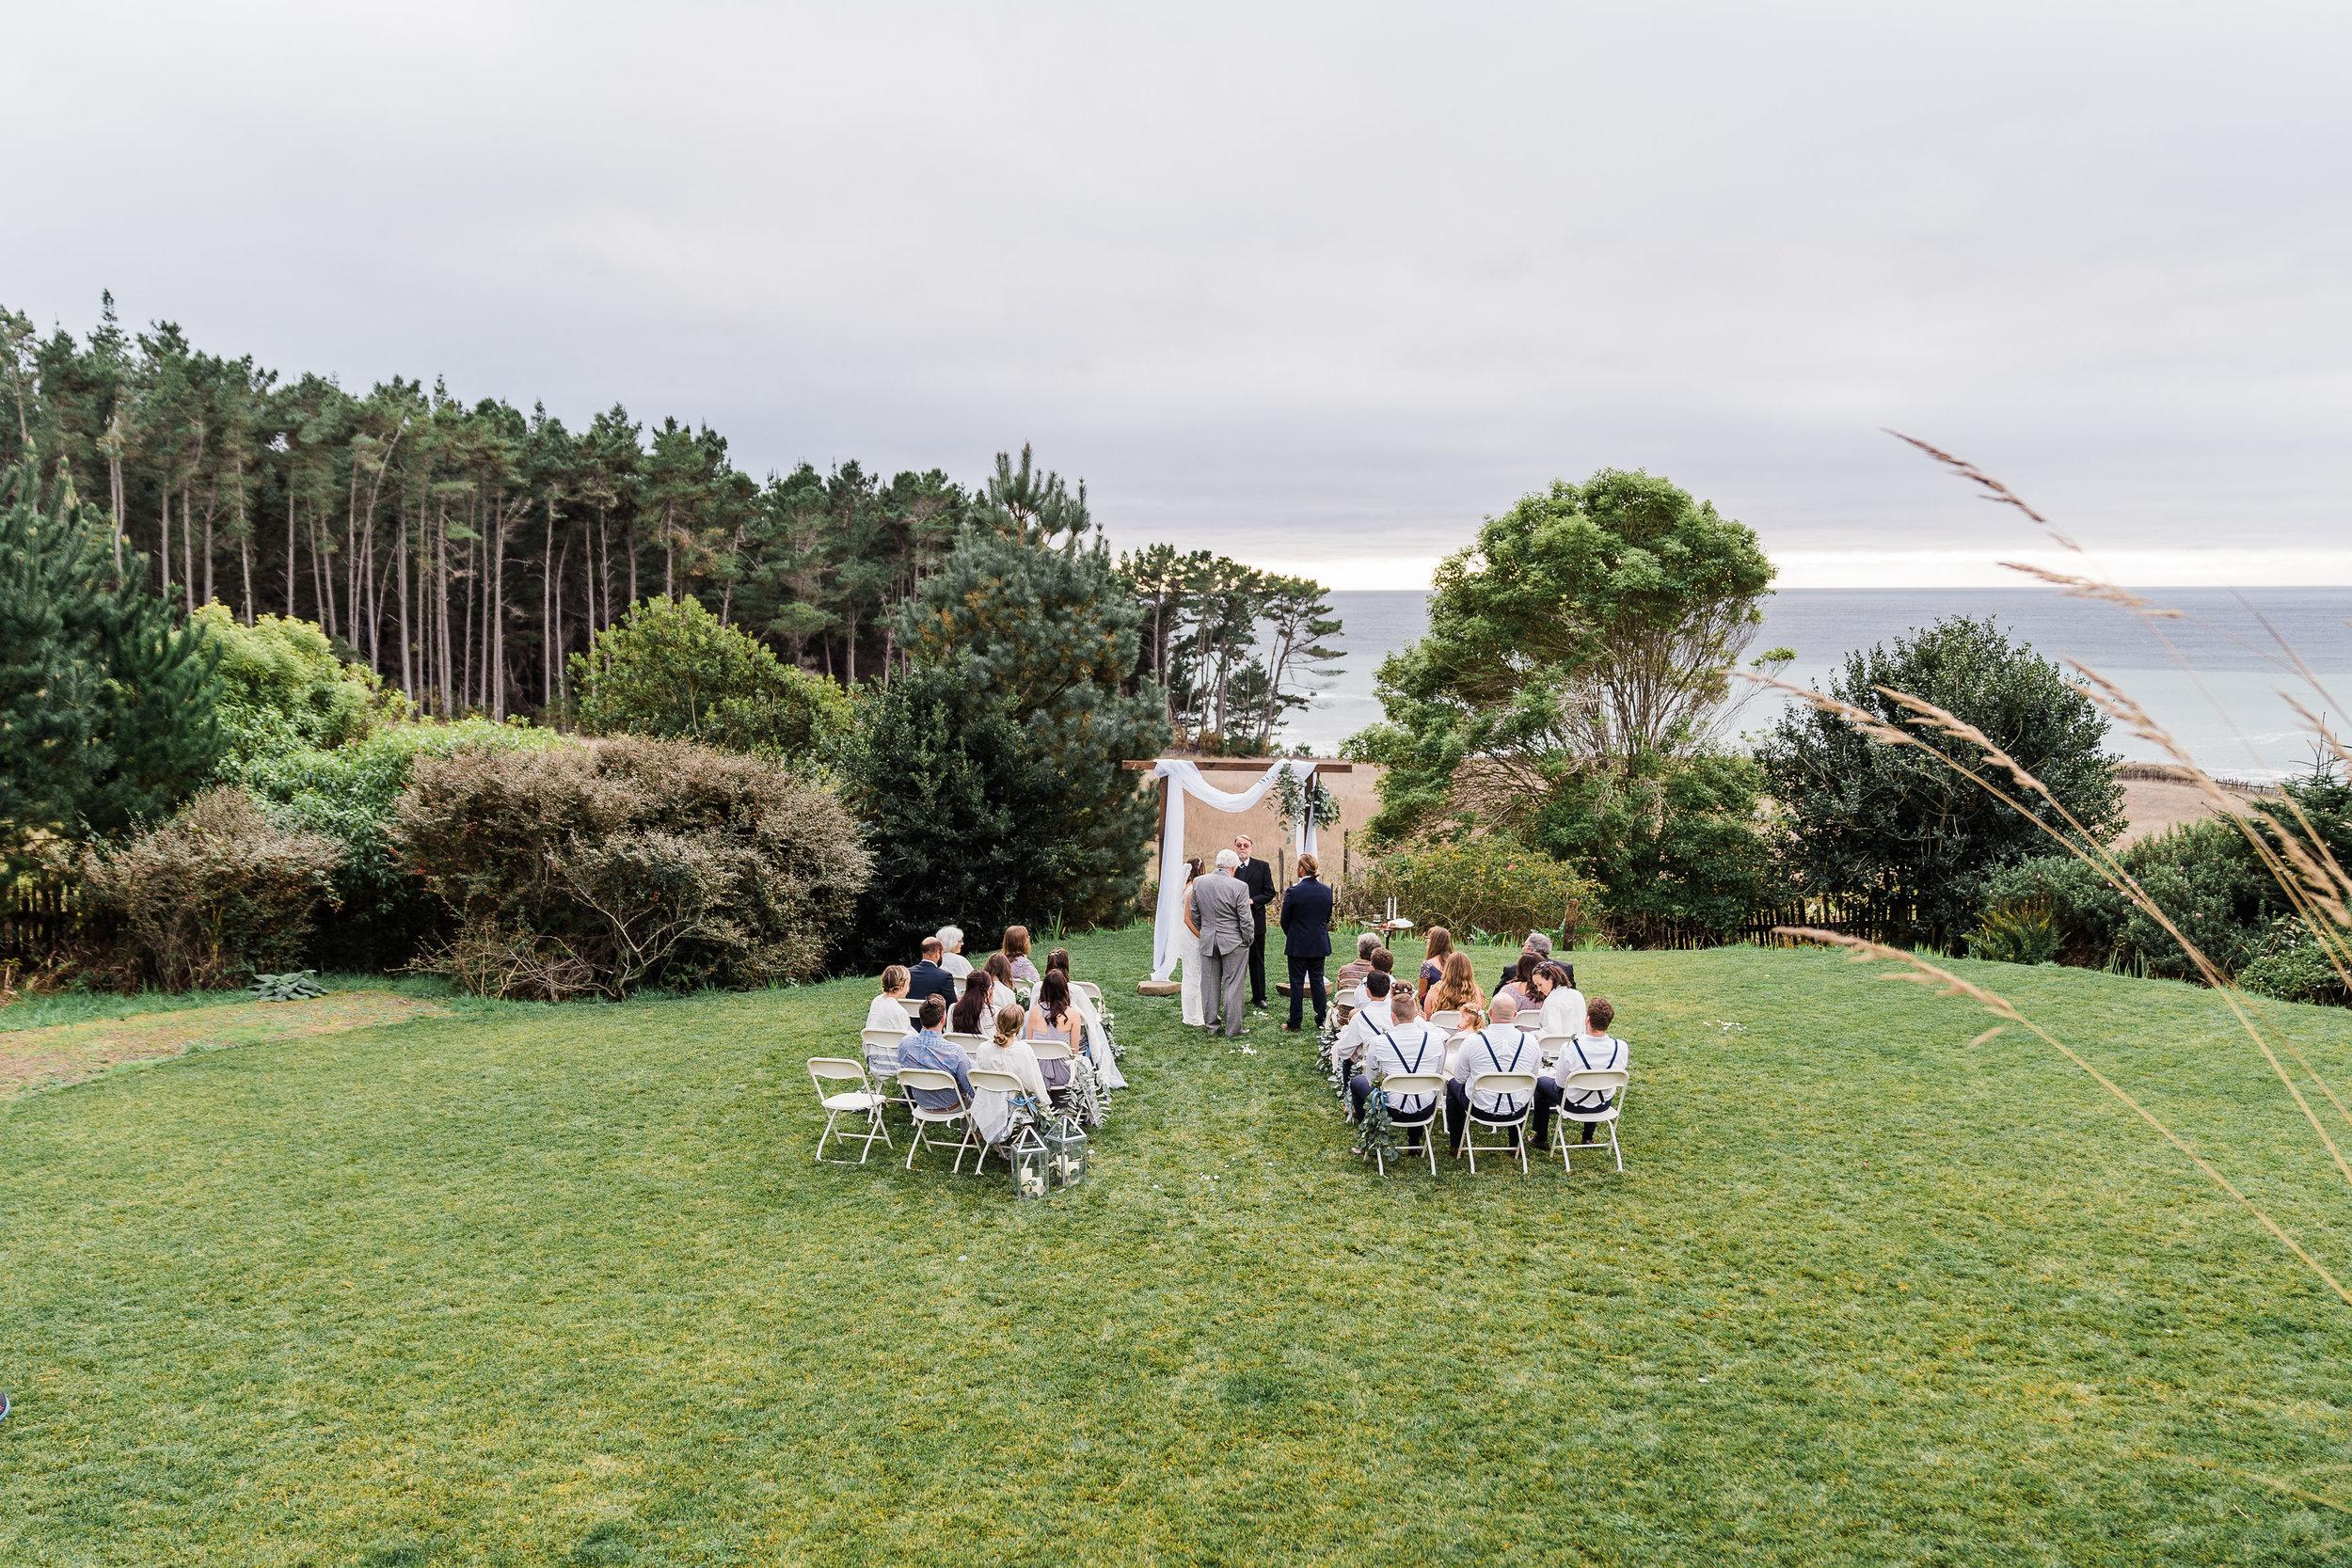 switzer-farm-wedding-westport-brandon-bibbins-photograhy-fine-art-059.jpg